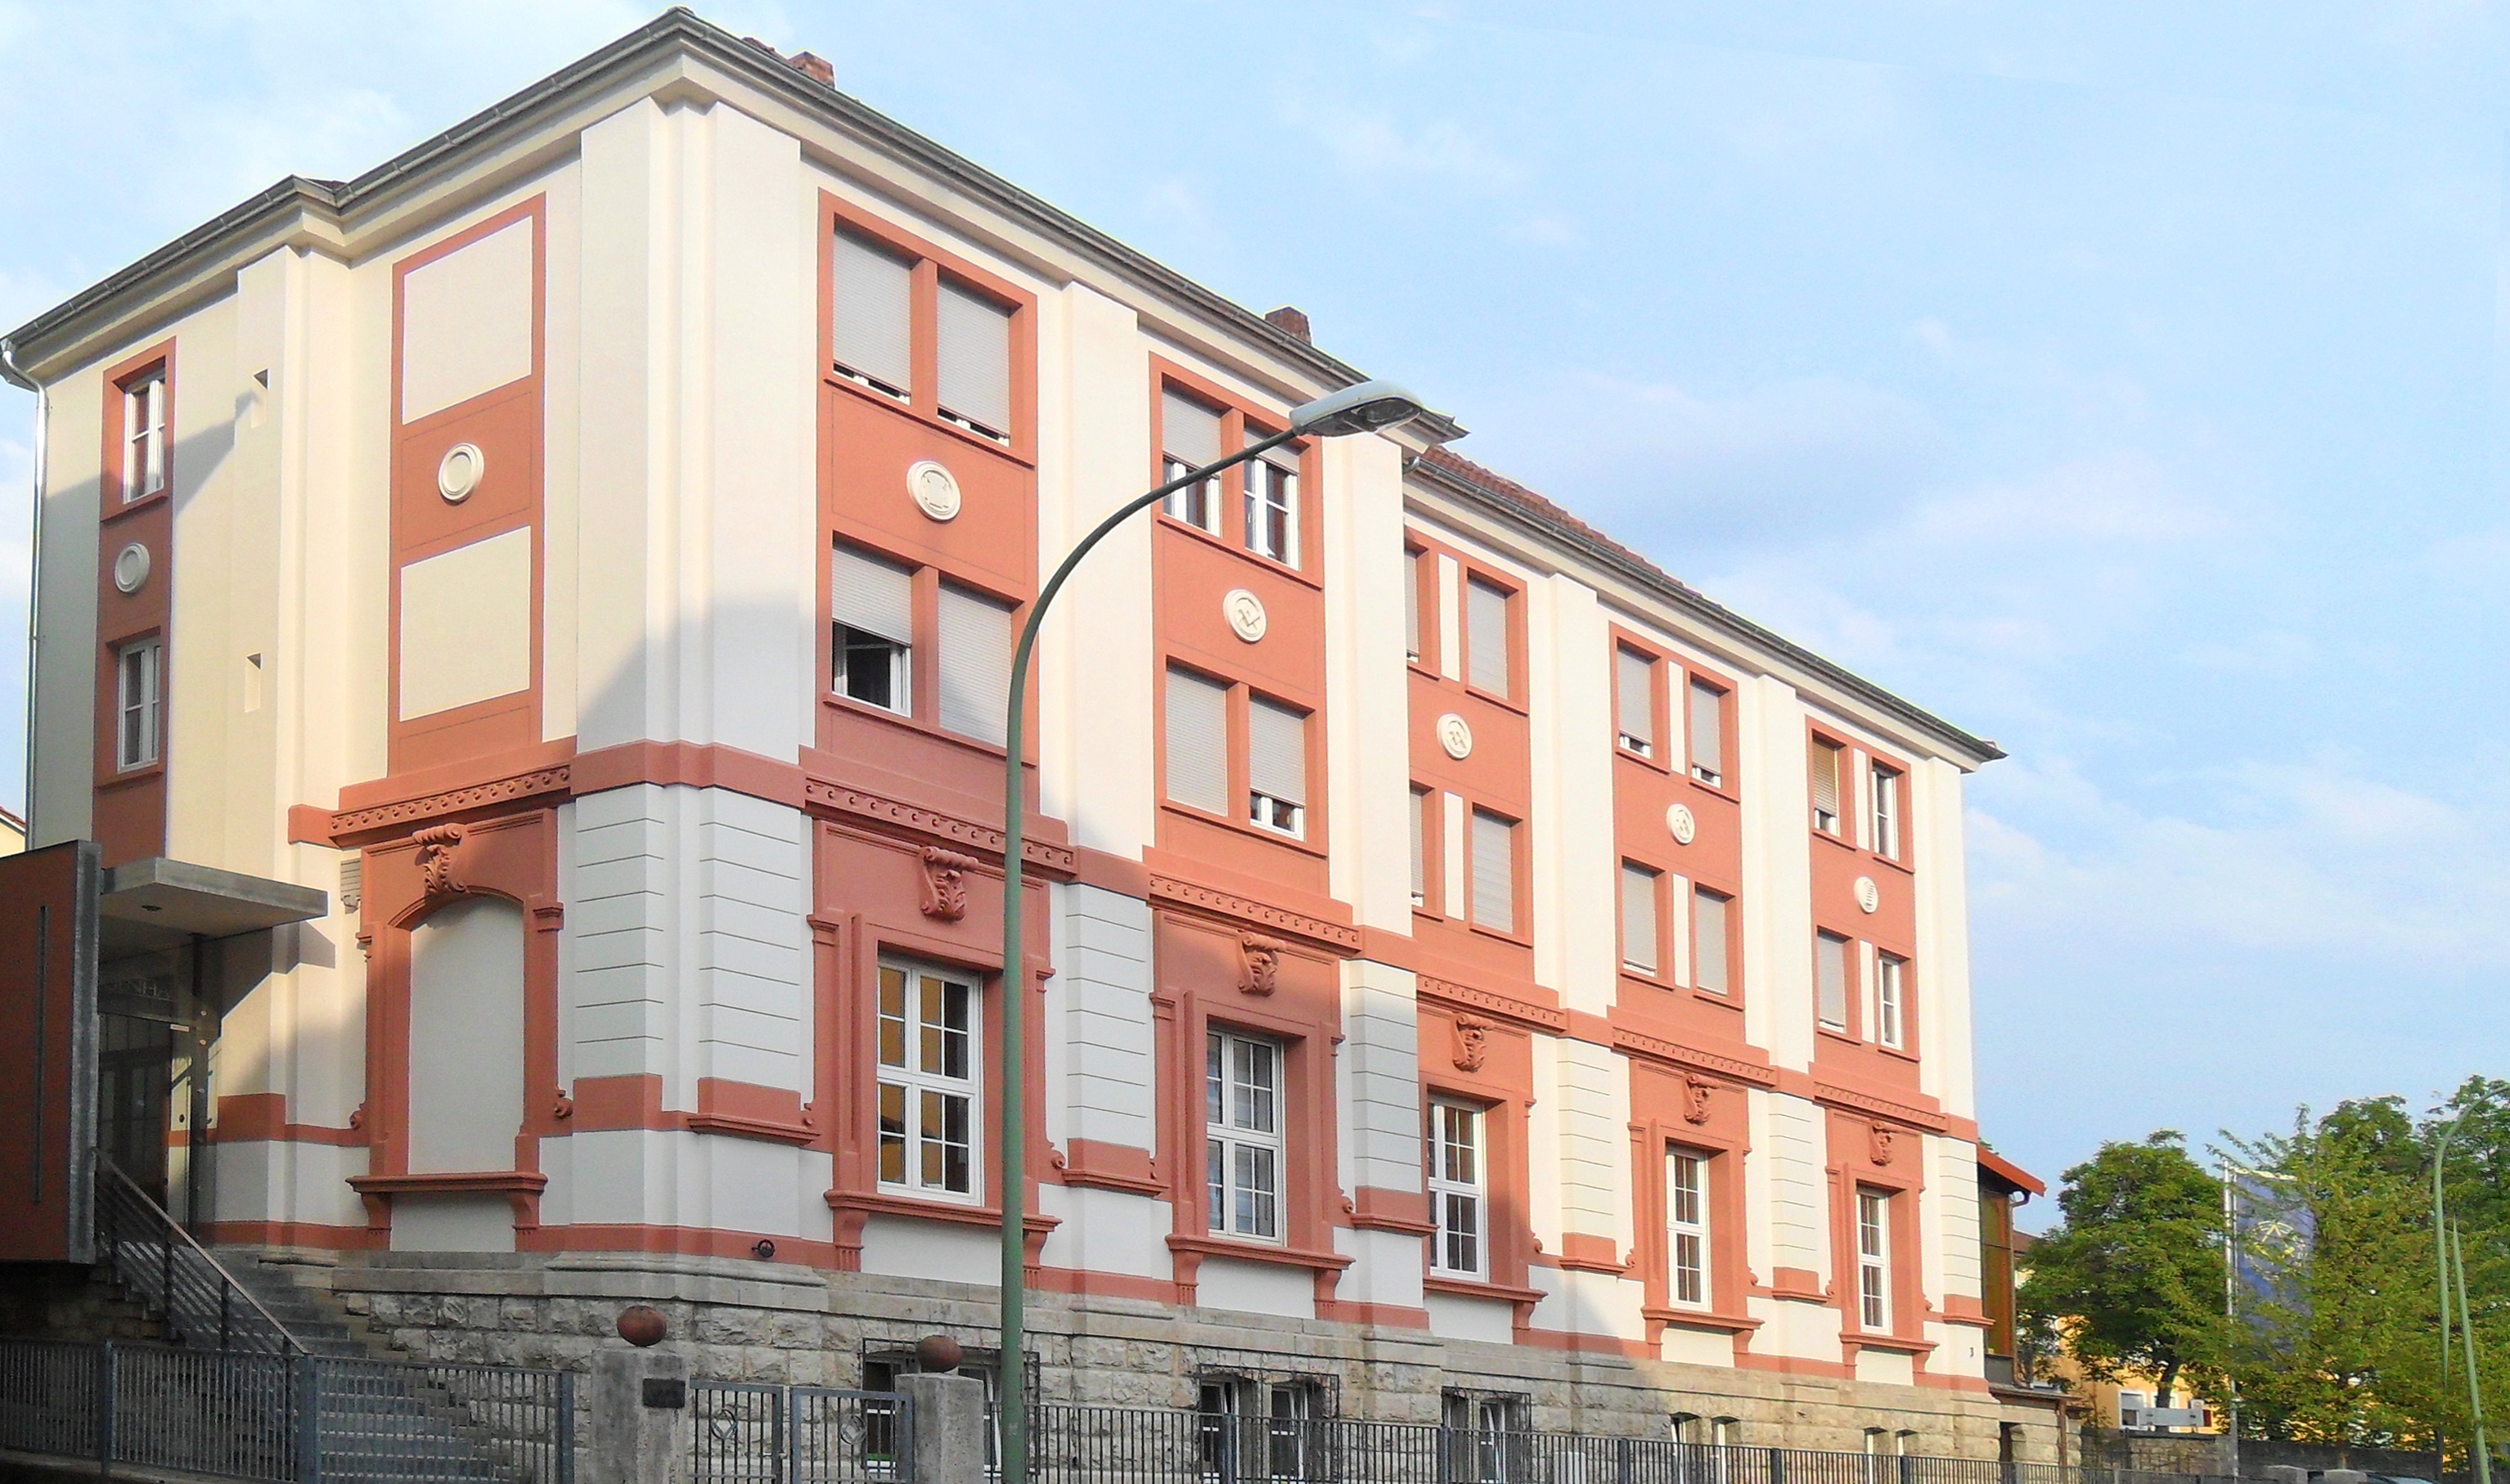 Würzburger logenhaus ev